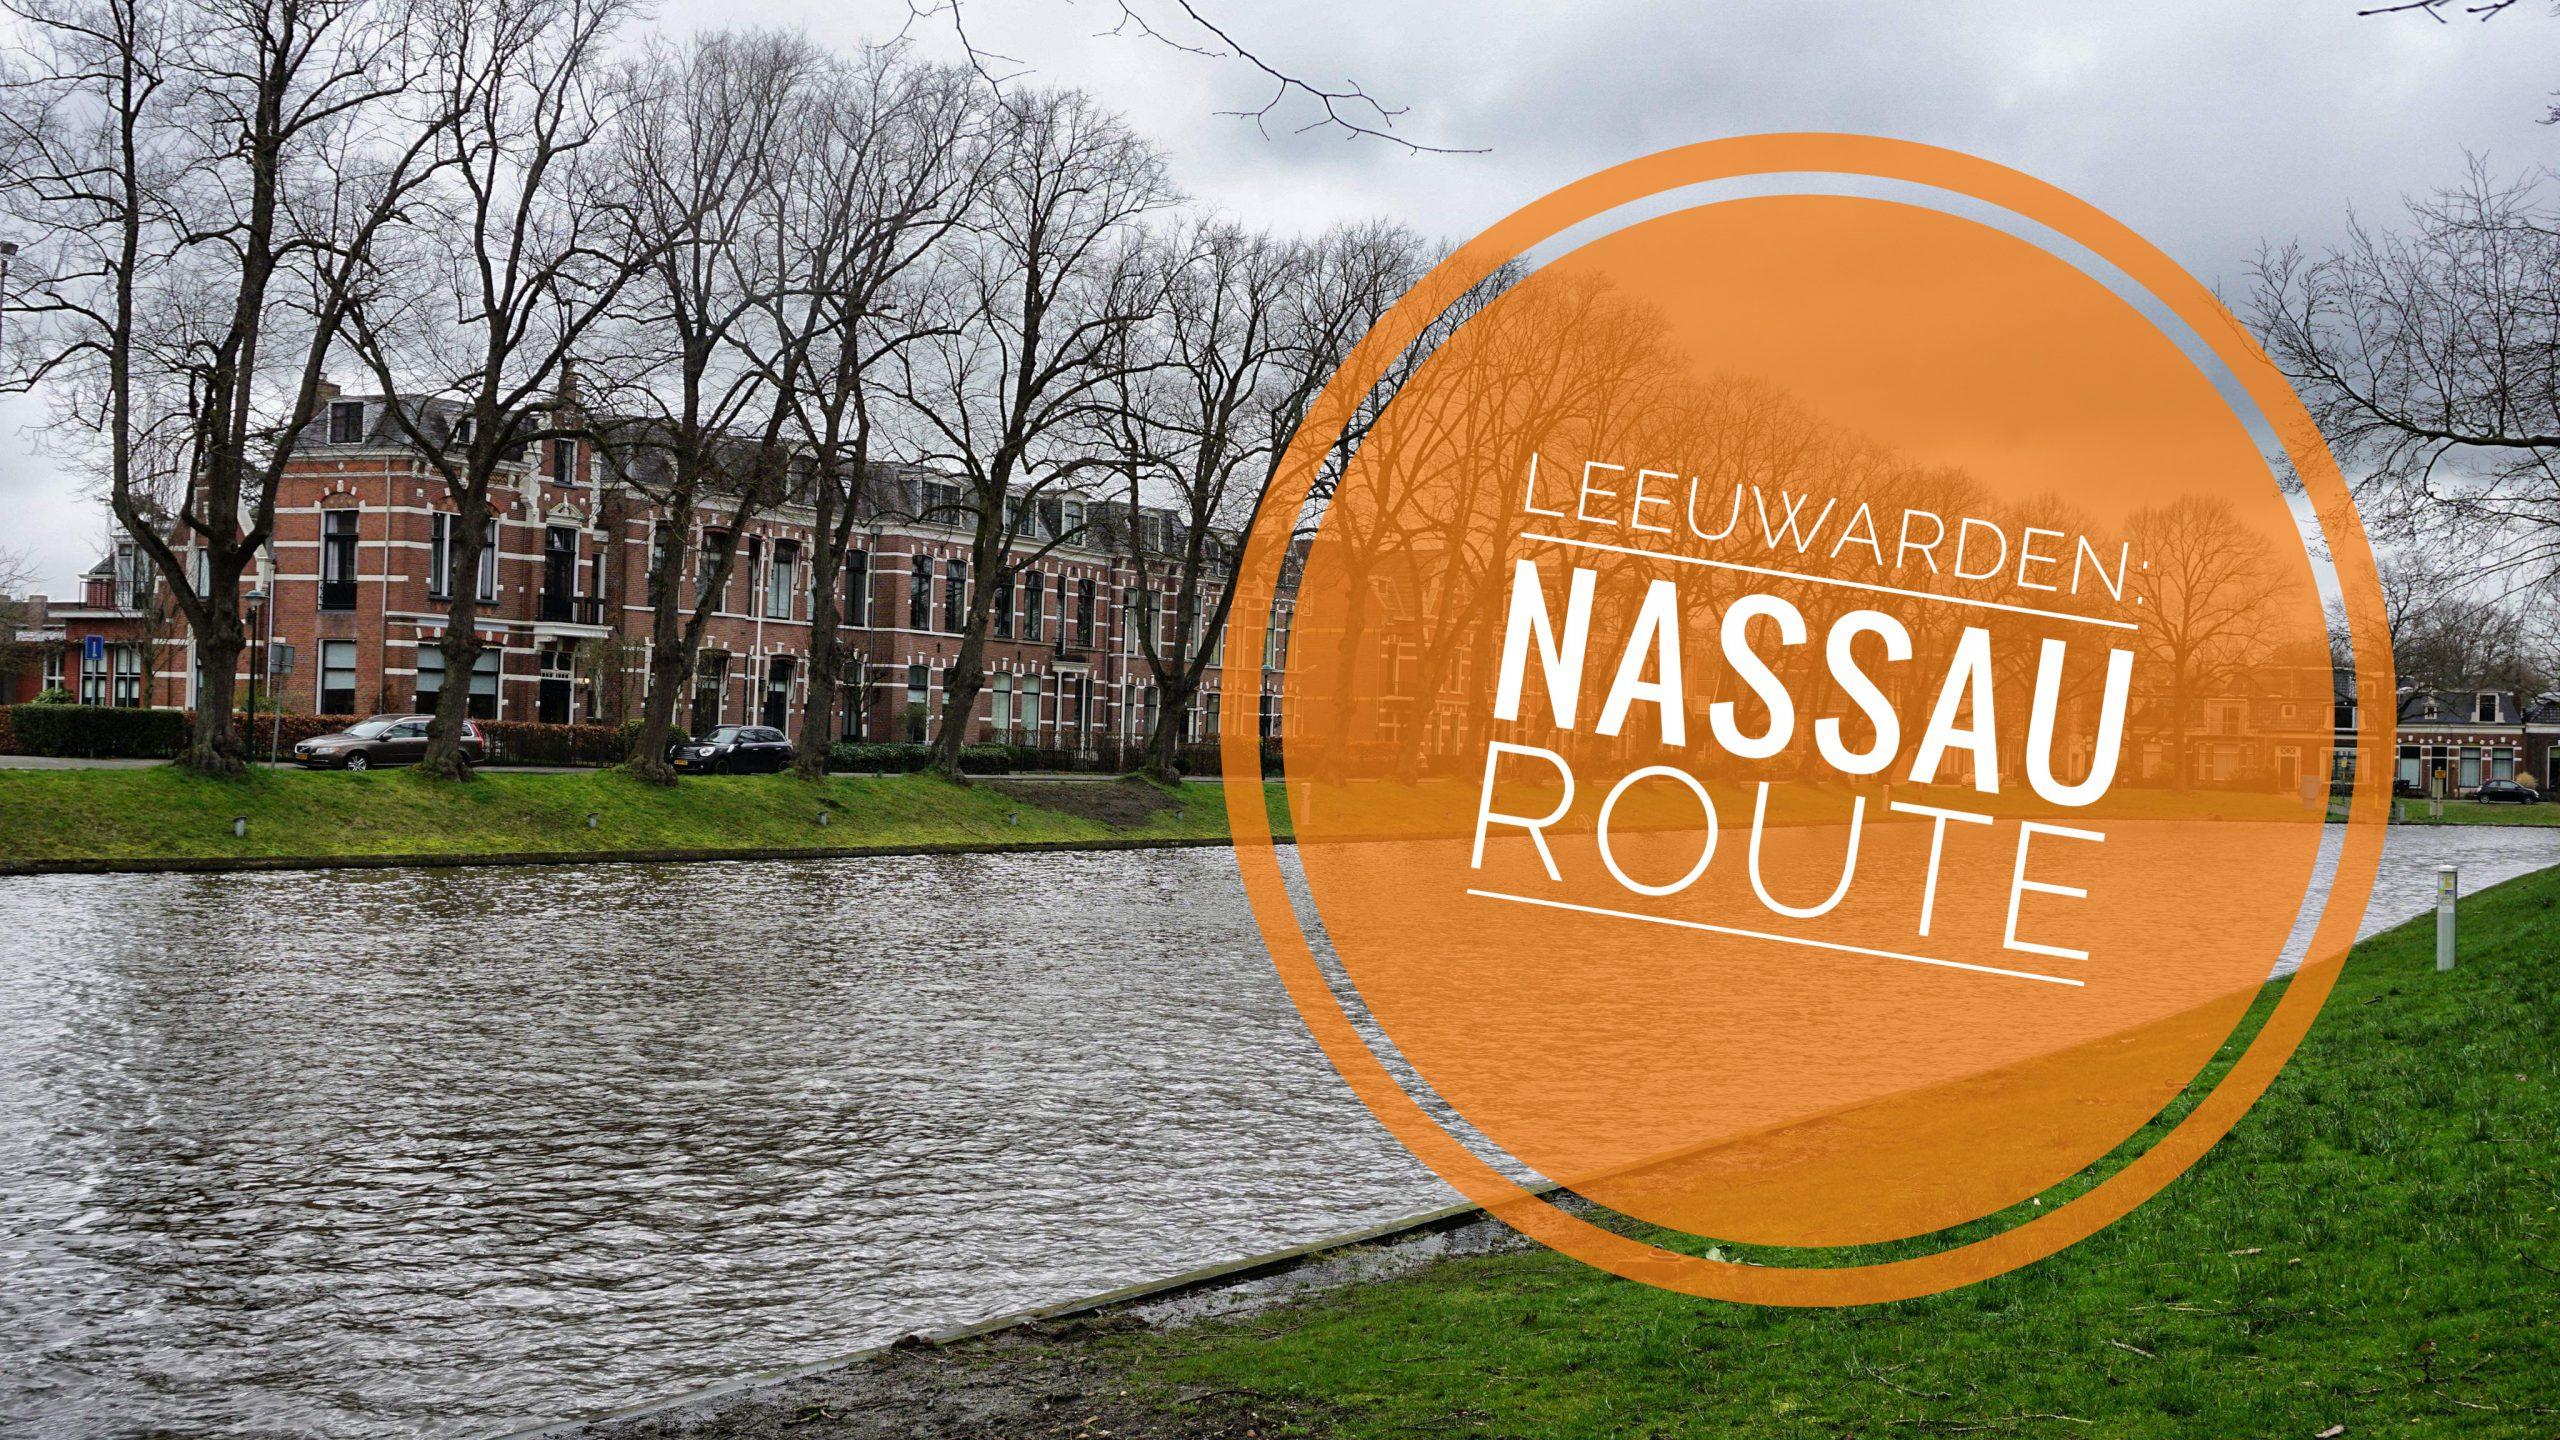 Nassauroute – Leeuwarden